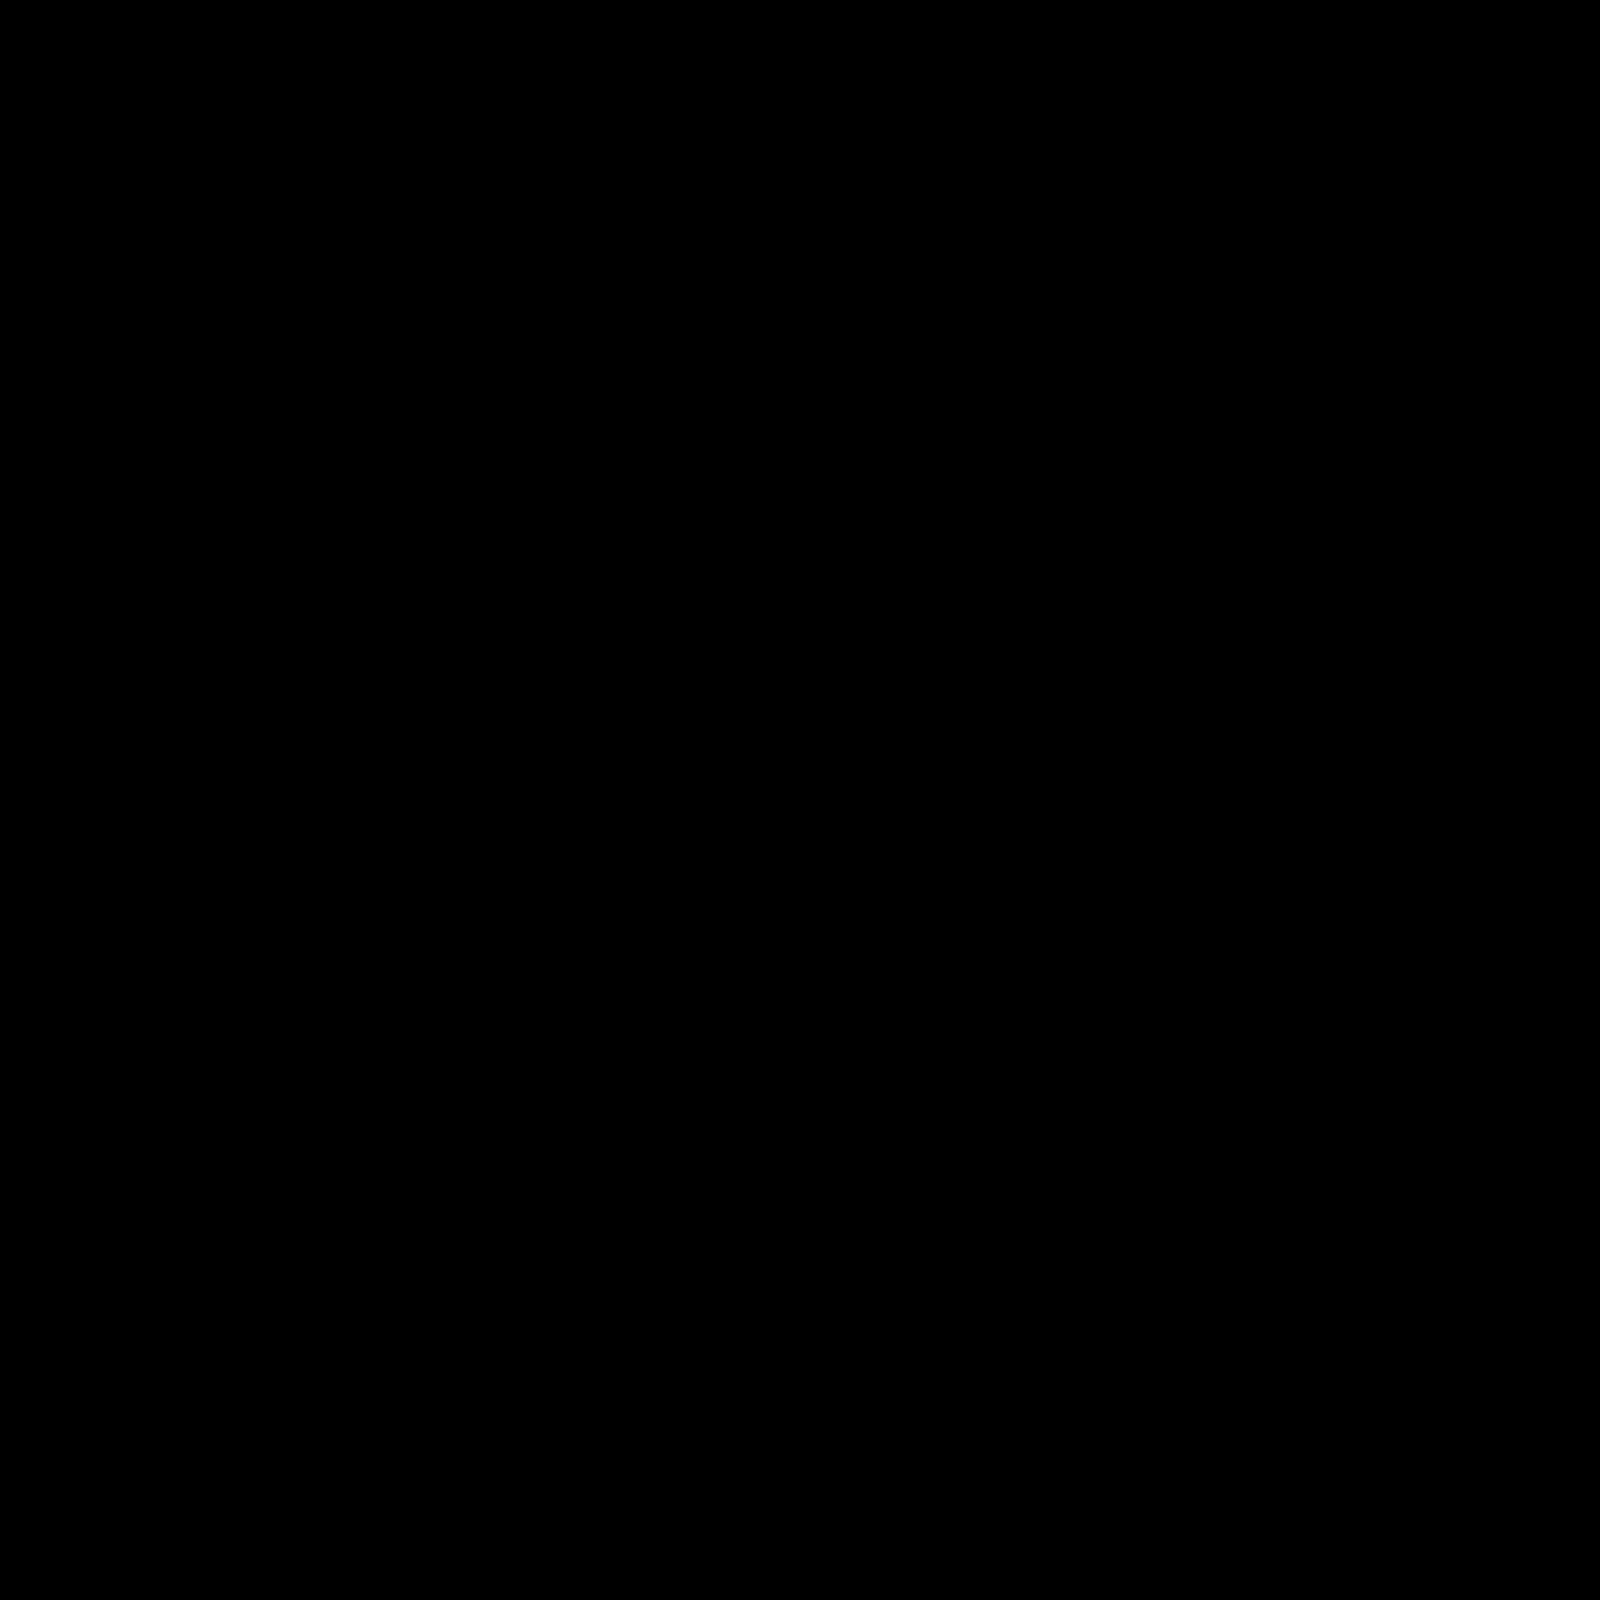 Texthöhe icon